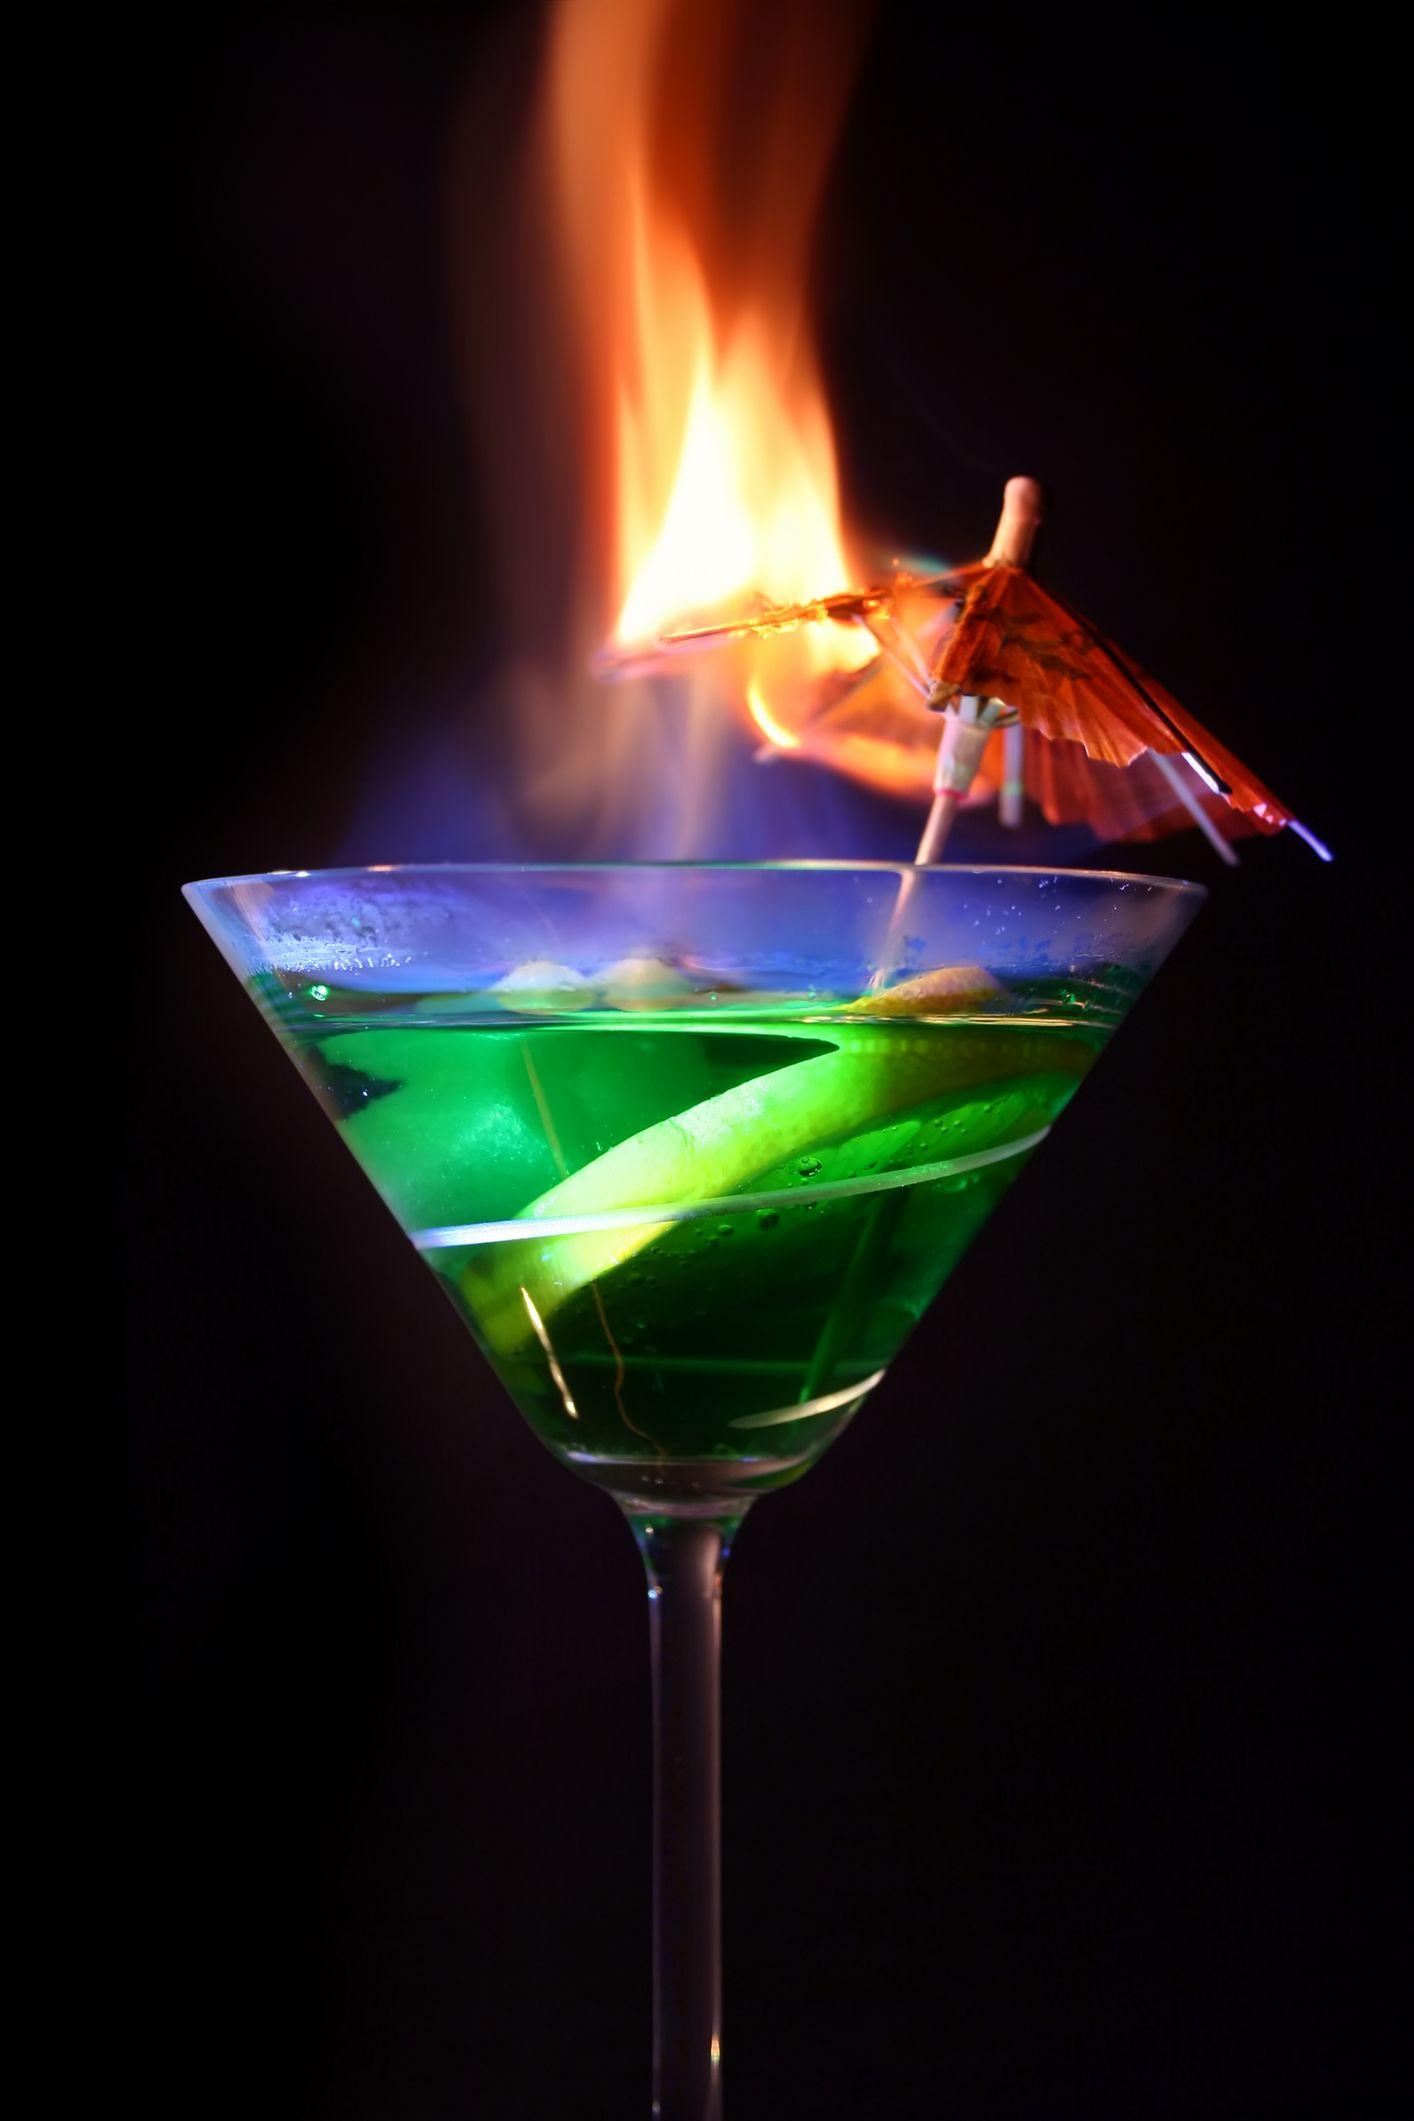 Vanity Beliebte Cocktails Gallery Of Google Image Result For Http://www.motivelegalreview/wp-